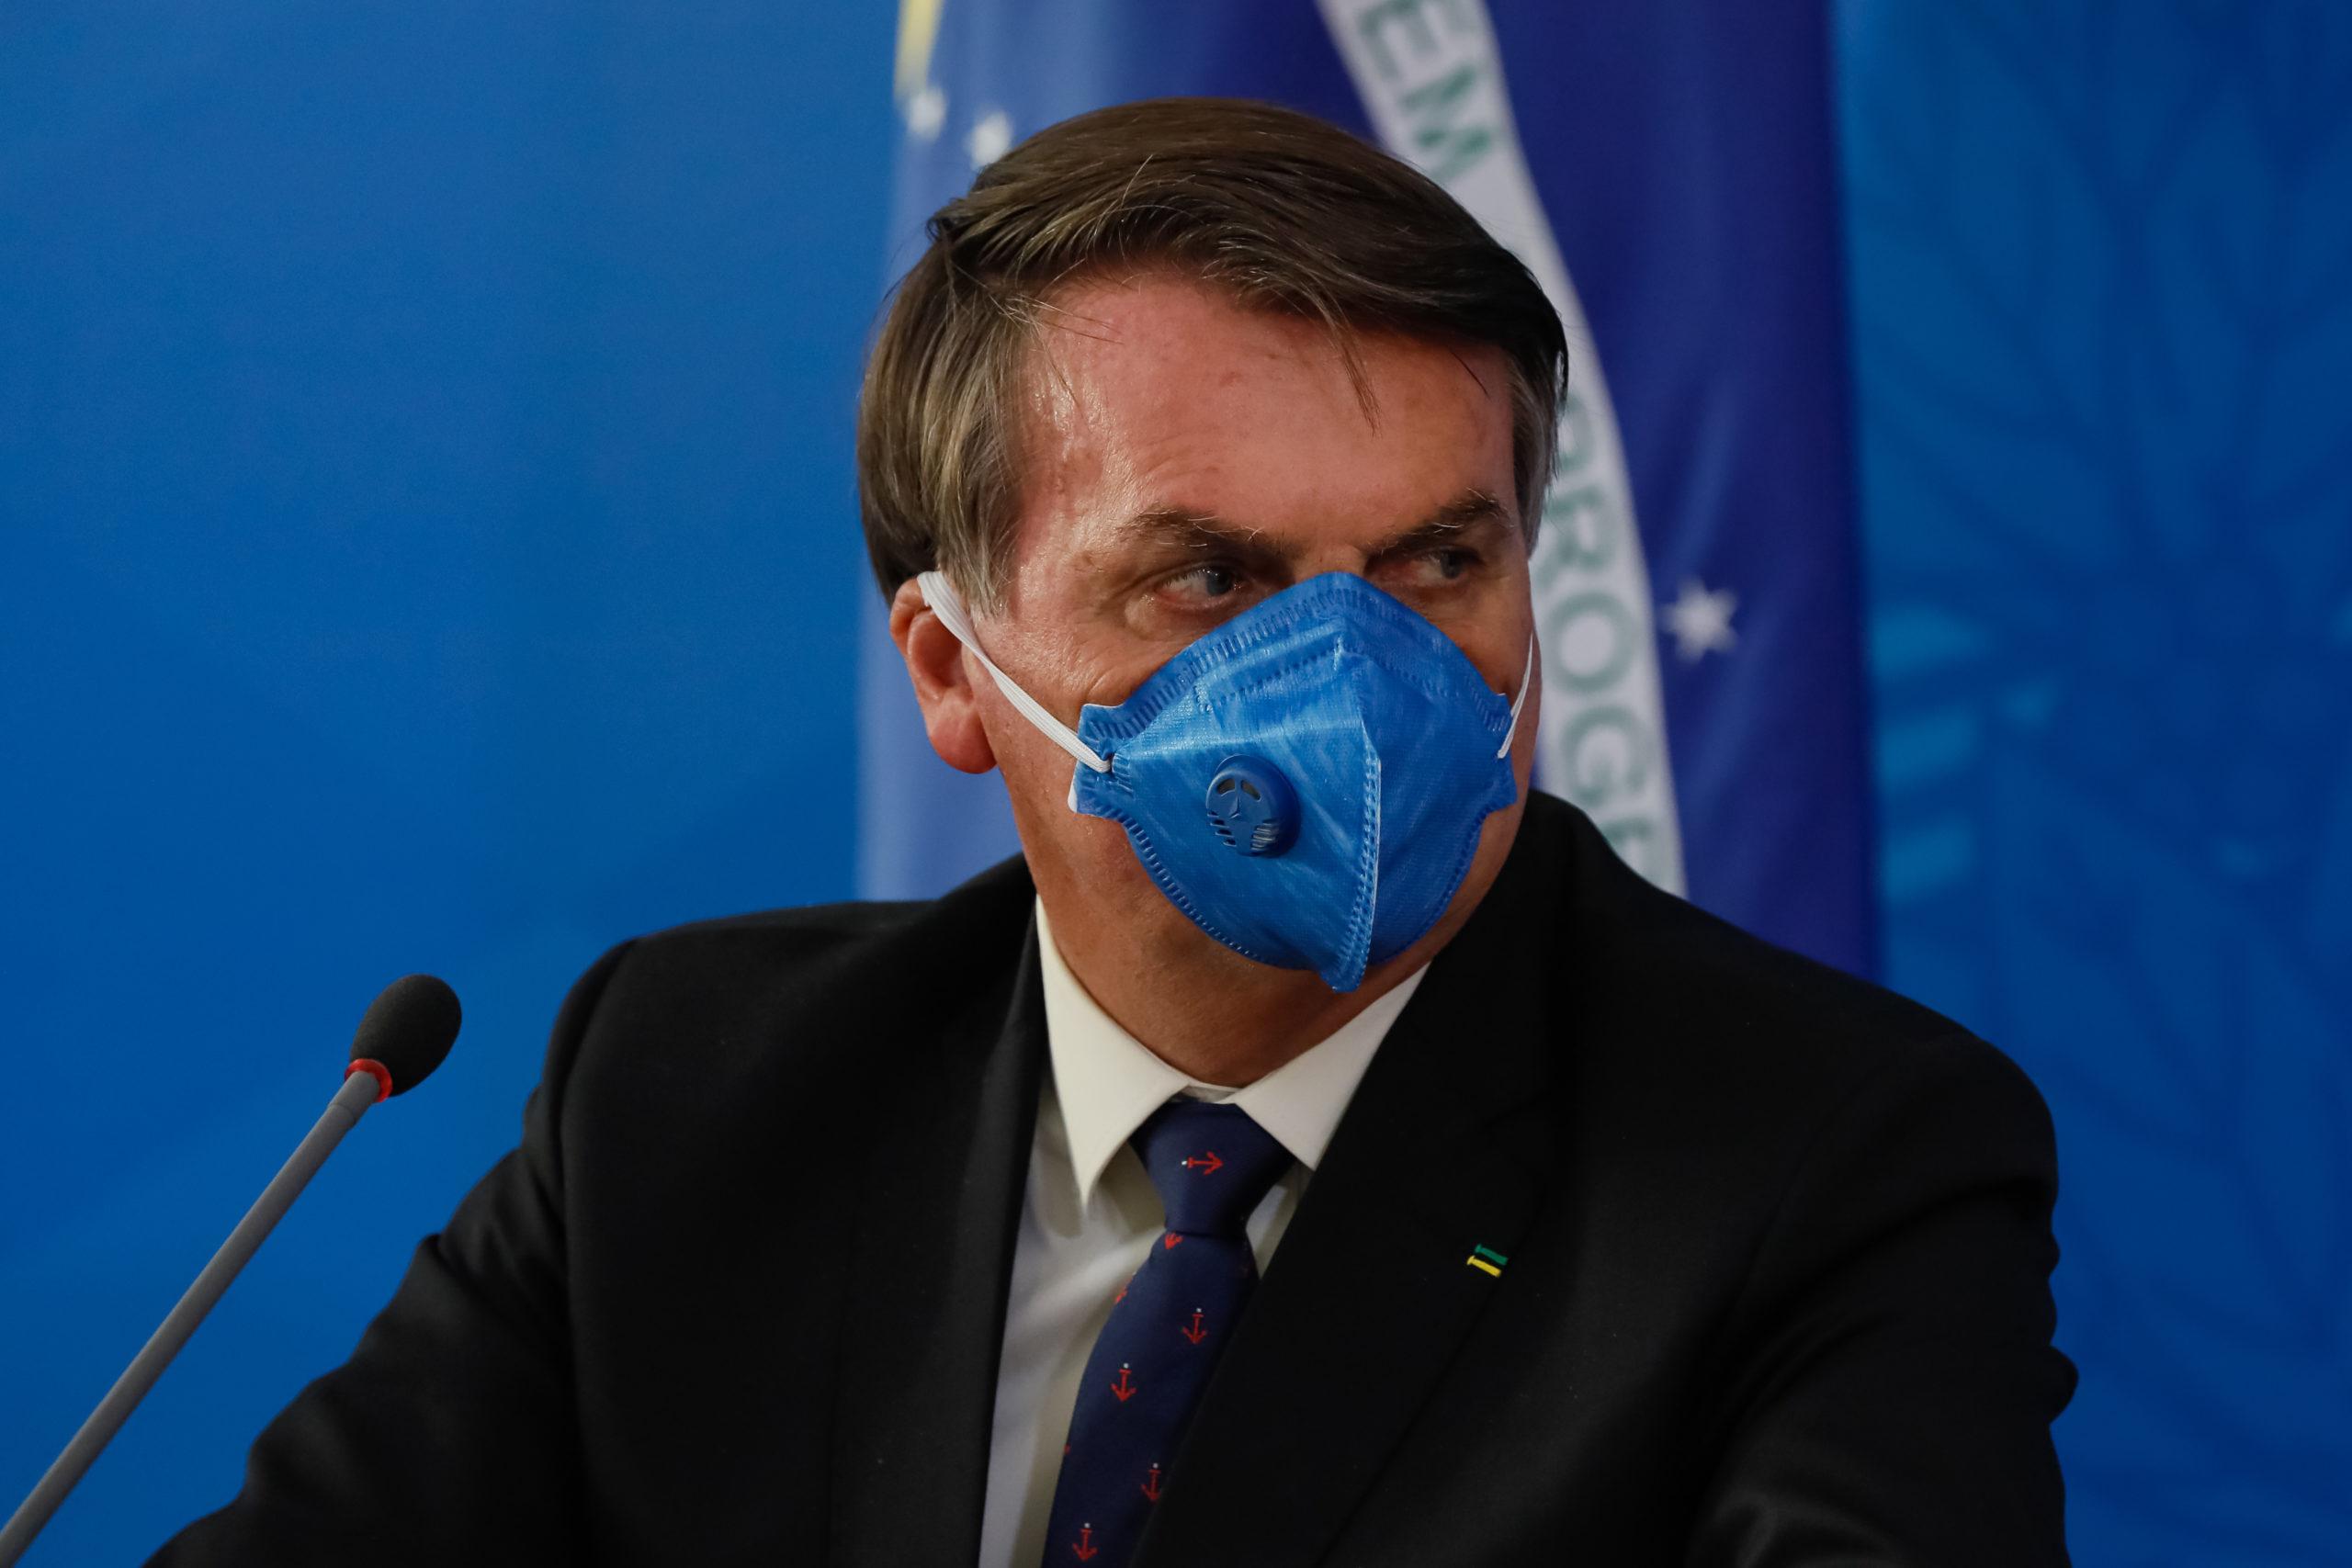 Coronavírus: Bolsonaro é denunciado em tribunal internacional